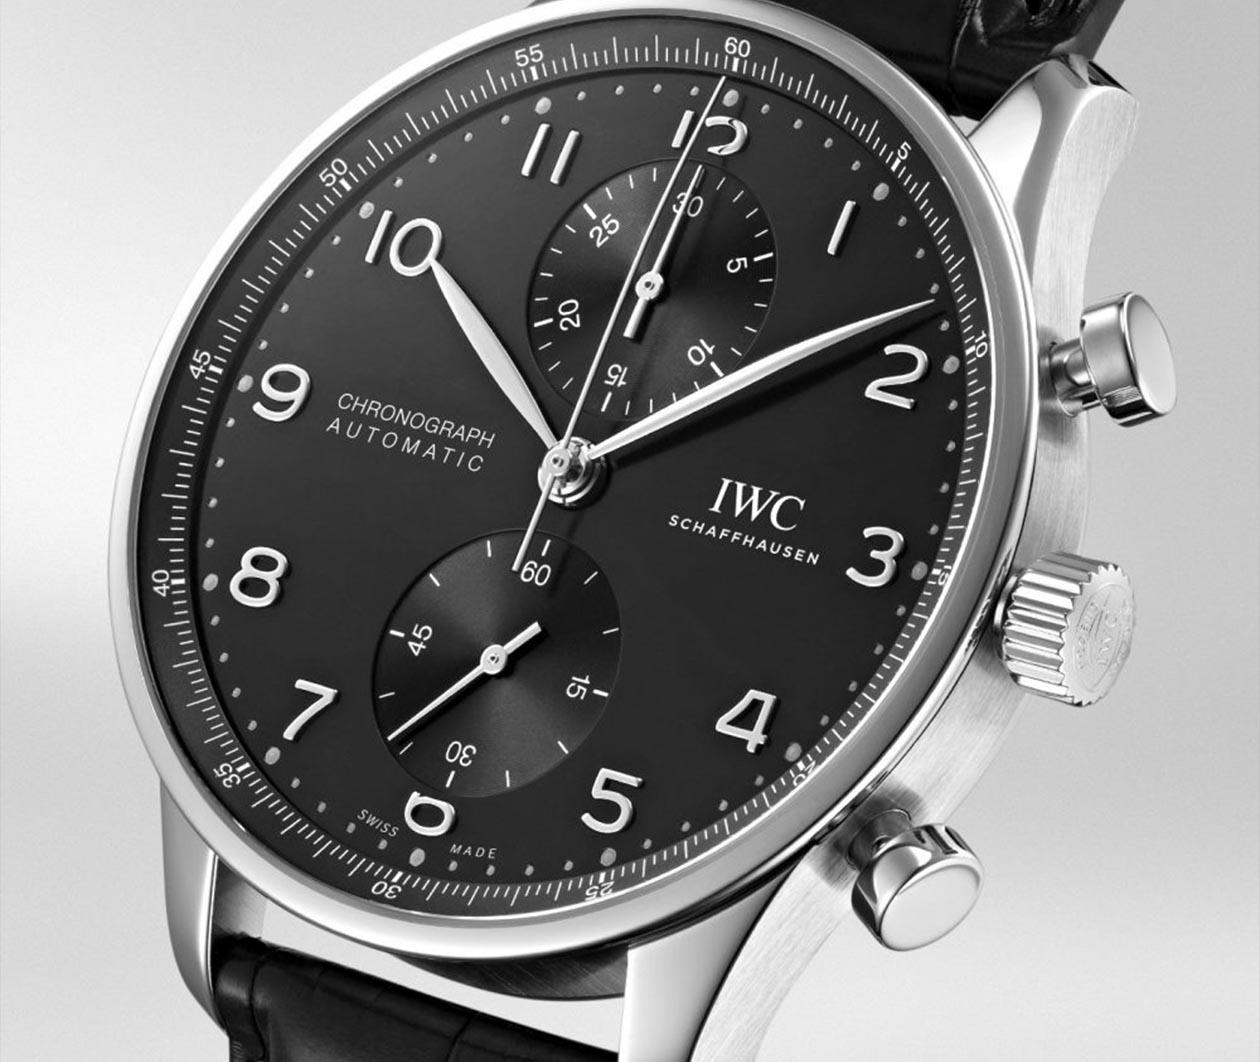 IWC Portugieser Chronograph IW371609 Carousel 3 FINAL